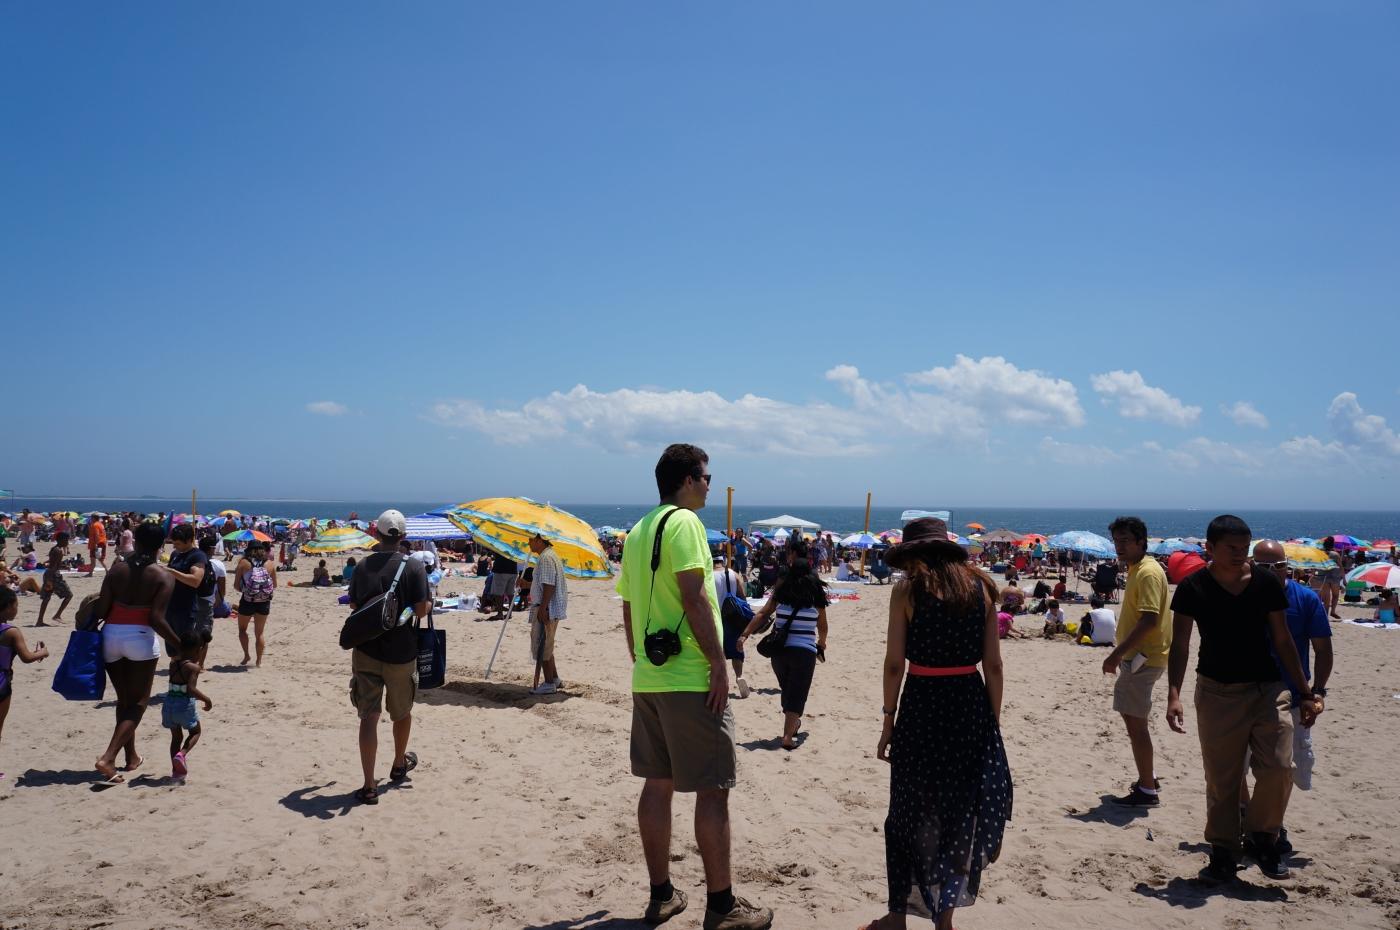 [jiejoy]国庆日休闲---海、沙滩、人_图1-11